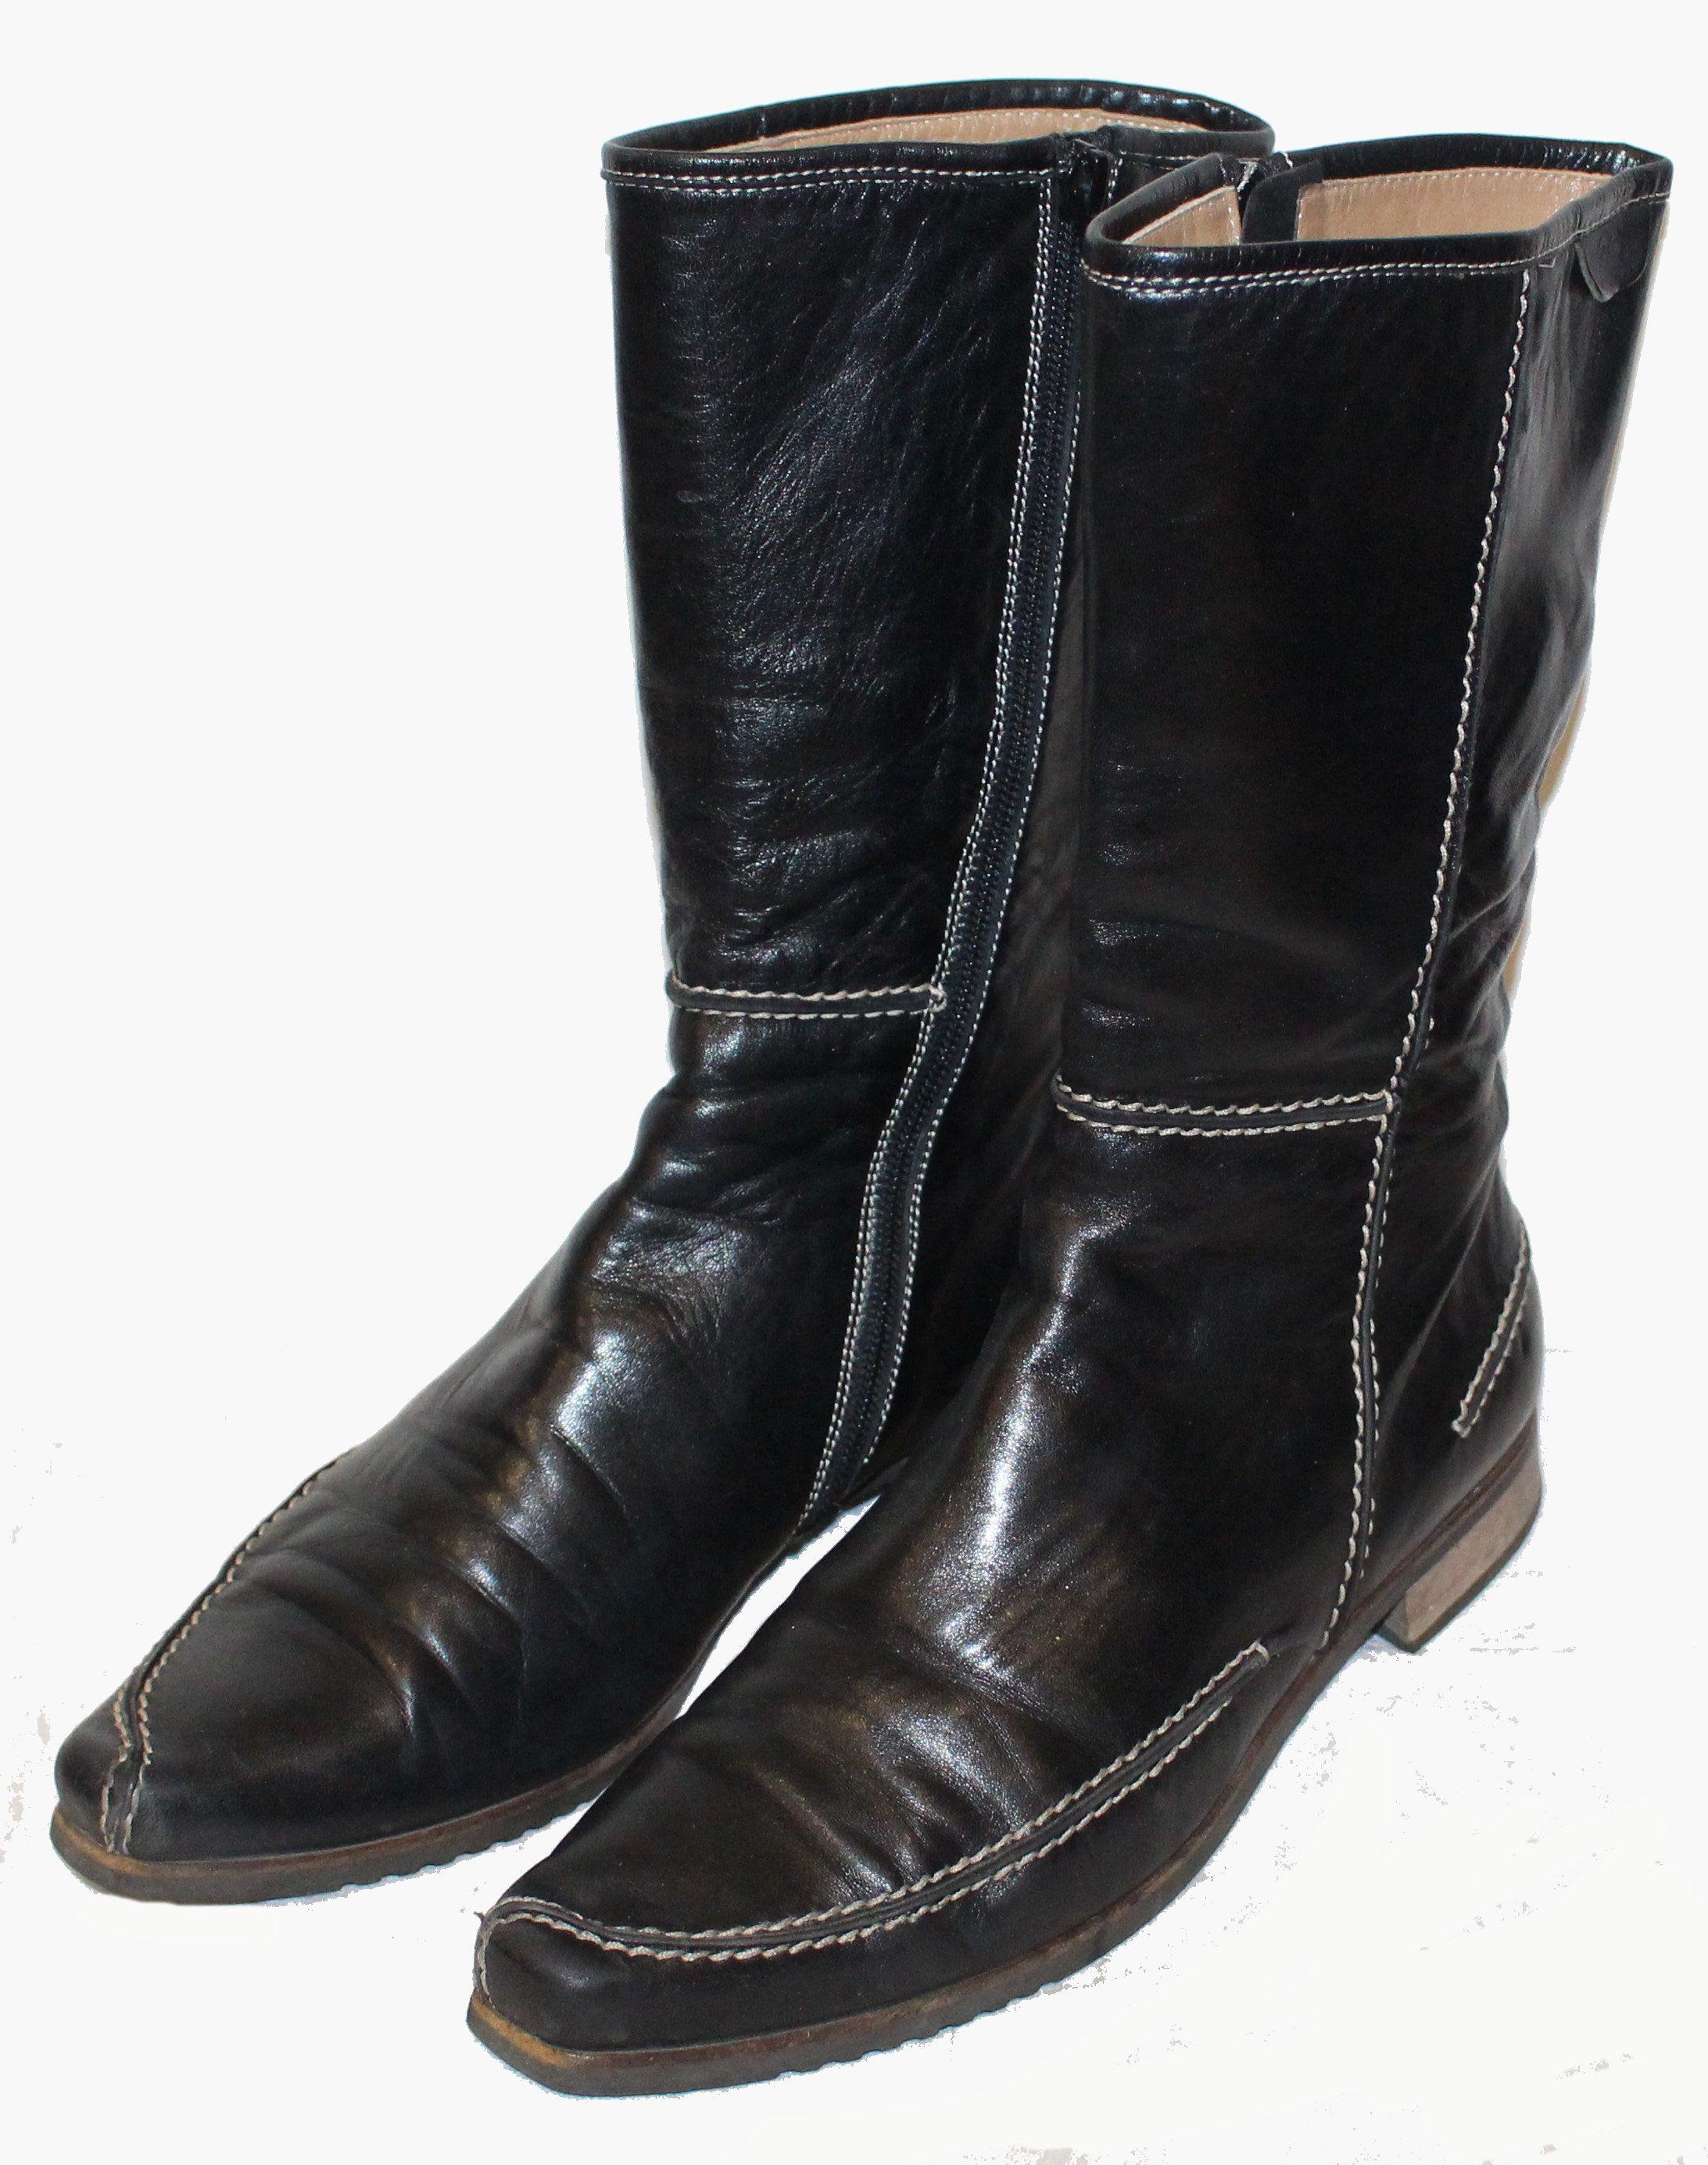 JIL SANDER Reit STIEFEL schwarz LEDER Gr. 36 | Schuhe